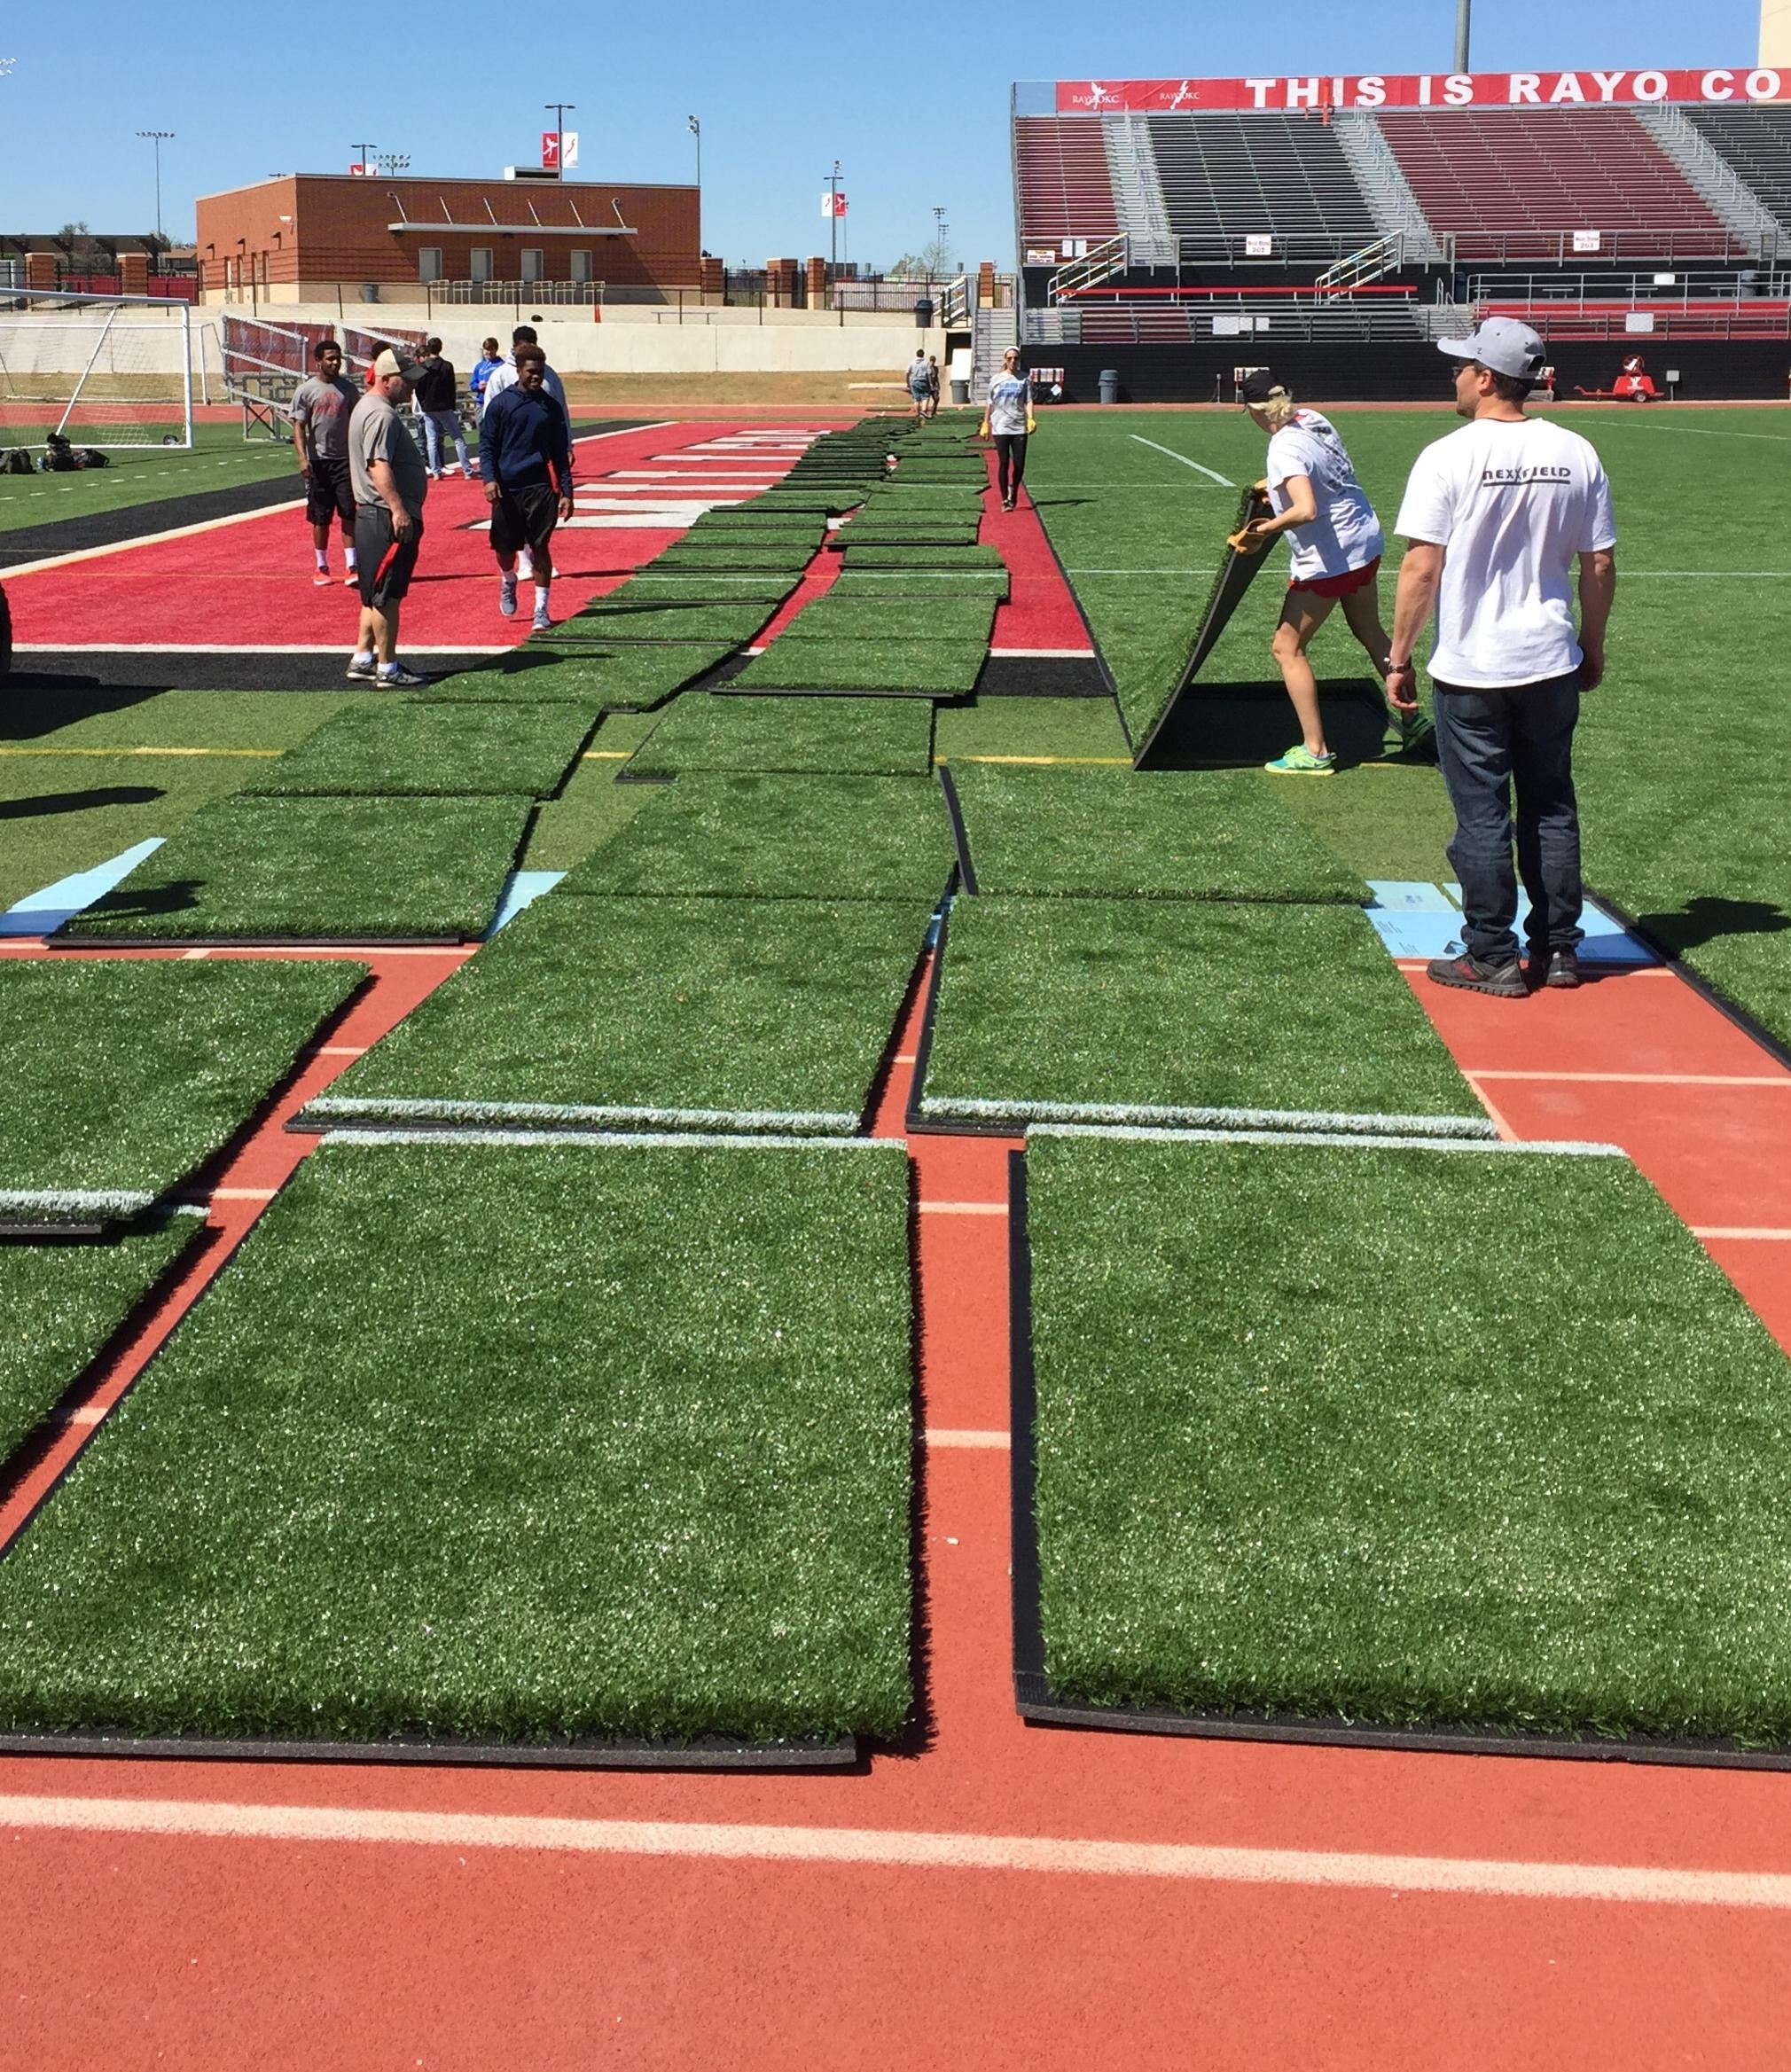 Rayo OKC, NASL Soccer team field E.2. Panel installation.